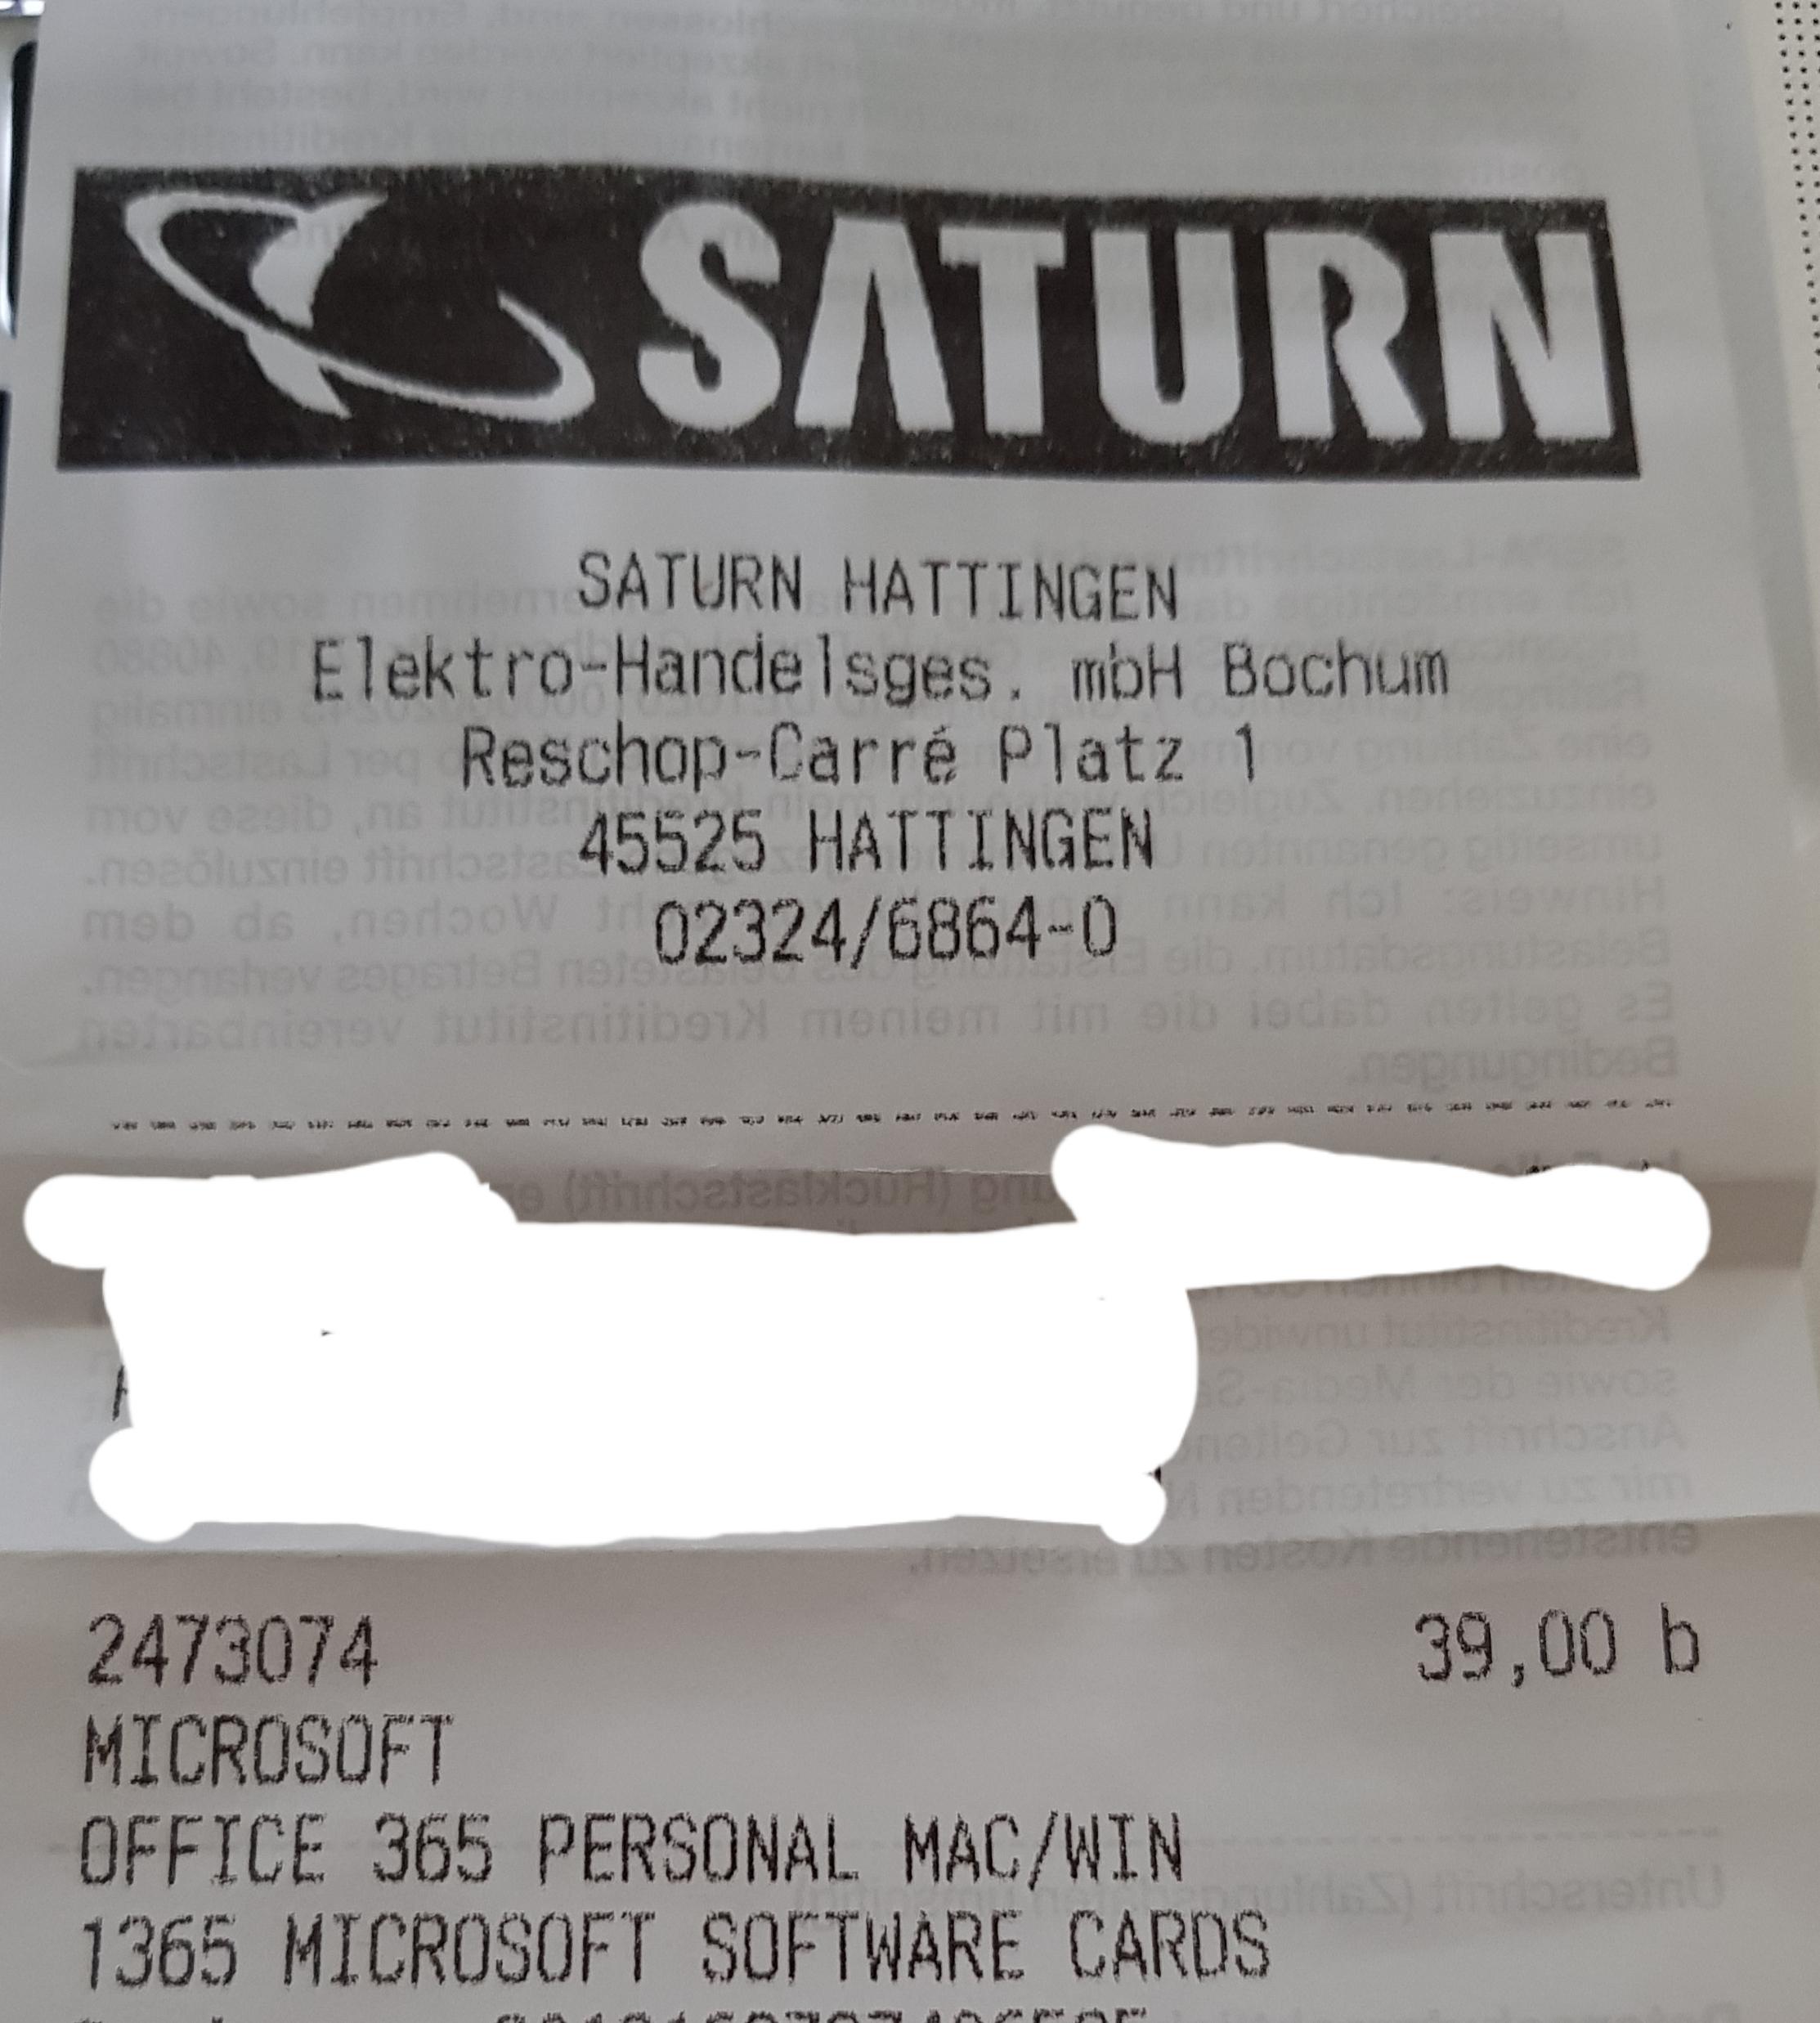 Saturn / Microsoft Office 365 Personal : Euro 39,- (nur lokal Hattingen/Bochum?)